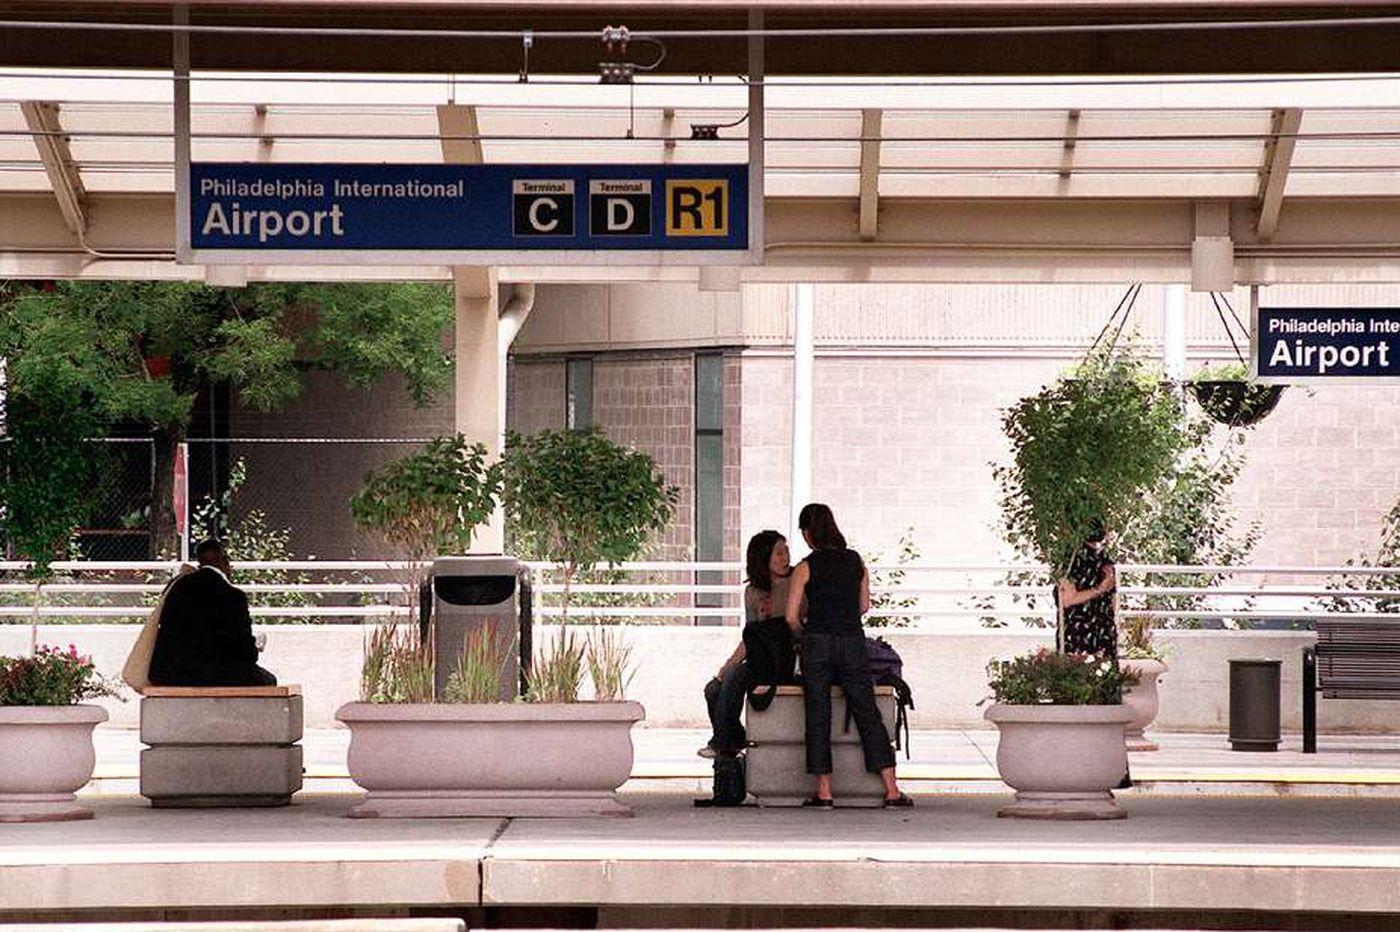 Major' SEPTA Regional Rail disruptions begin Saturday